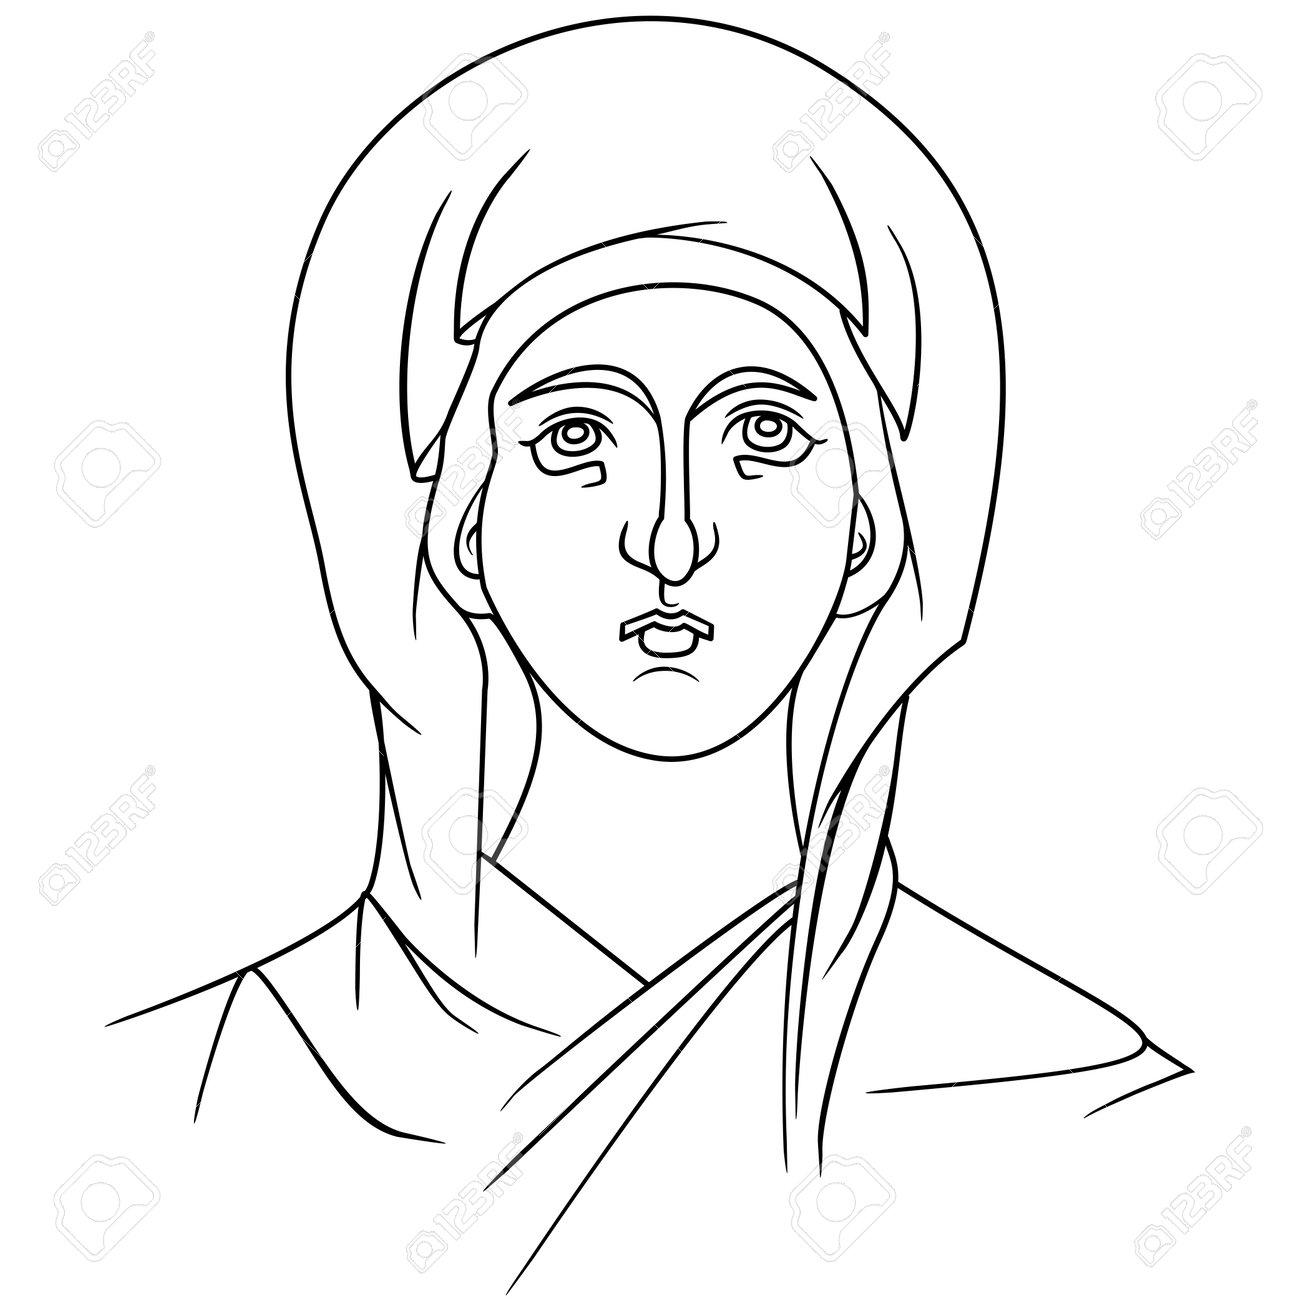 beautiful byzantine icon virgin deva divine outline art vector illustration mary madonna - 164182693